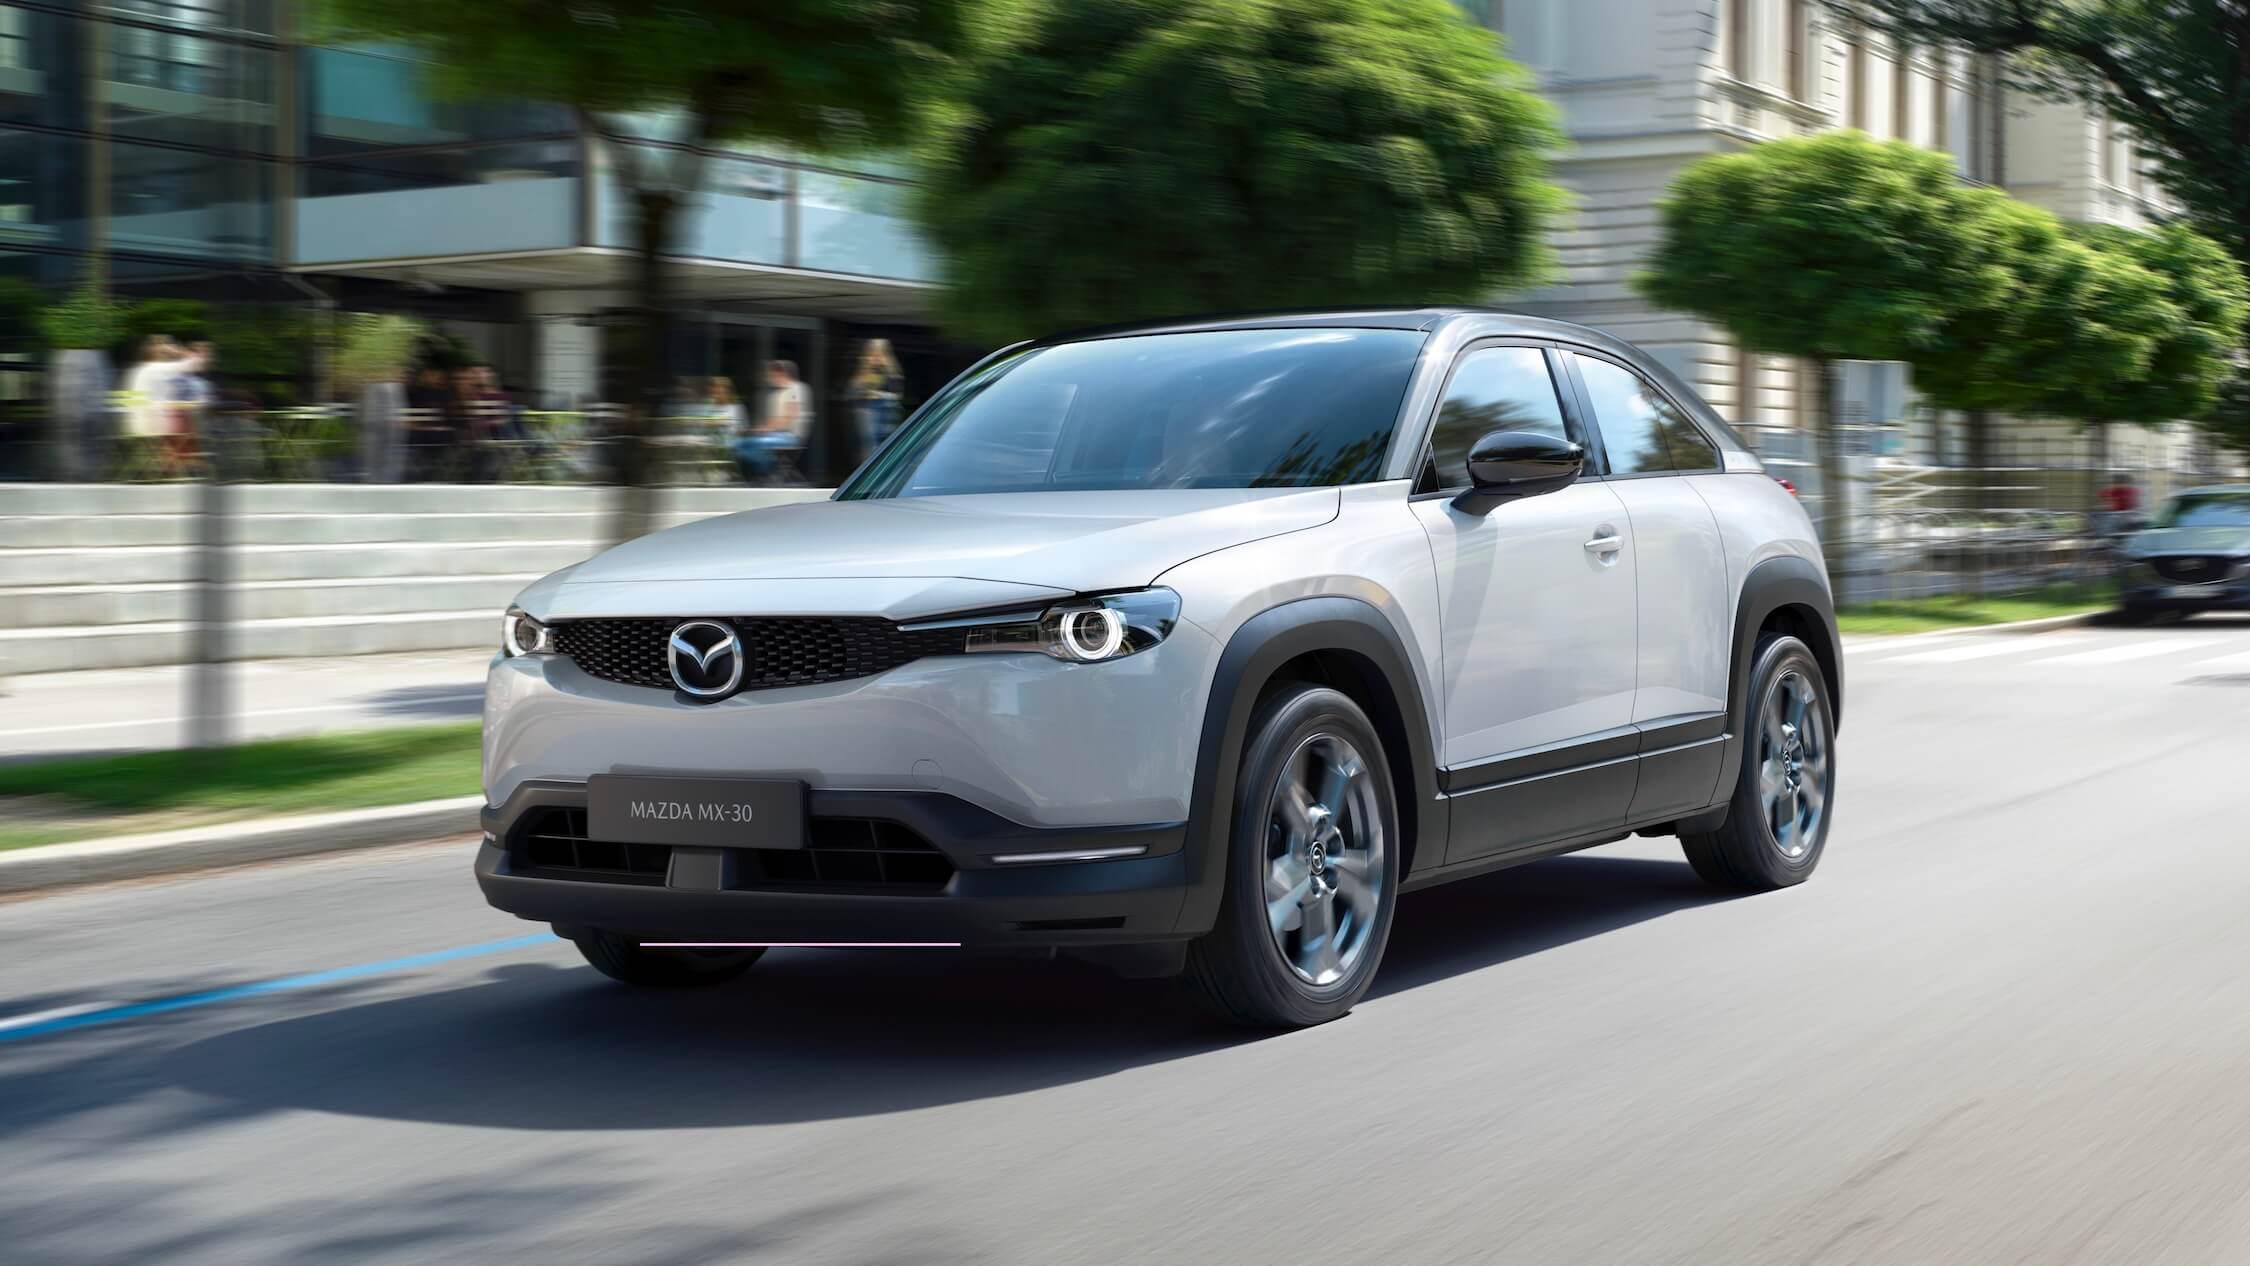 Mazda MX-30 elektrische SUV